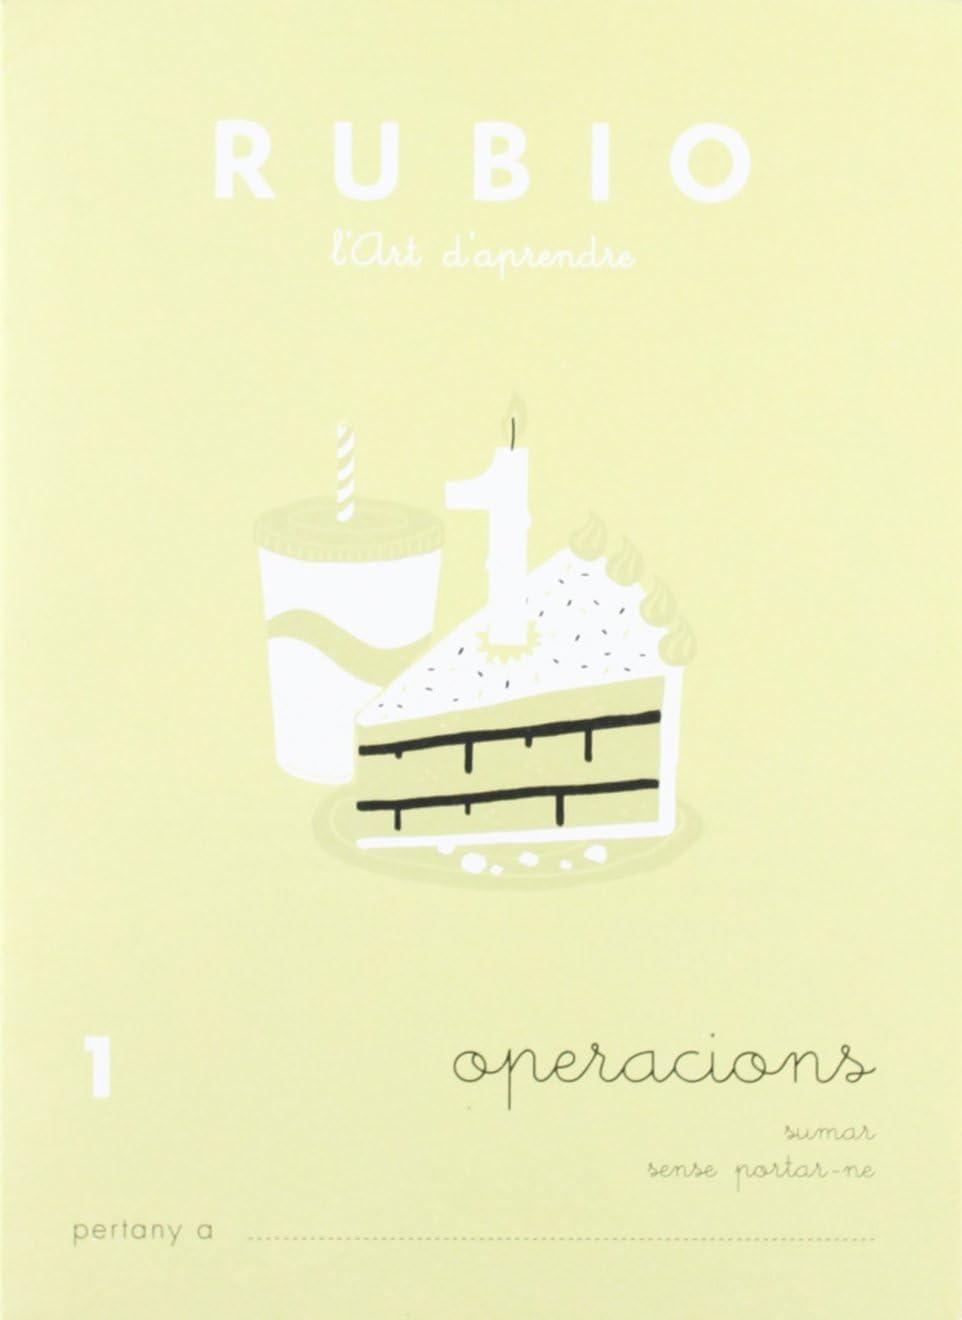 Rubio OP1 CAT - Cuaderno operaciones (Operacions i Problemes RUBIO (català))